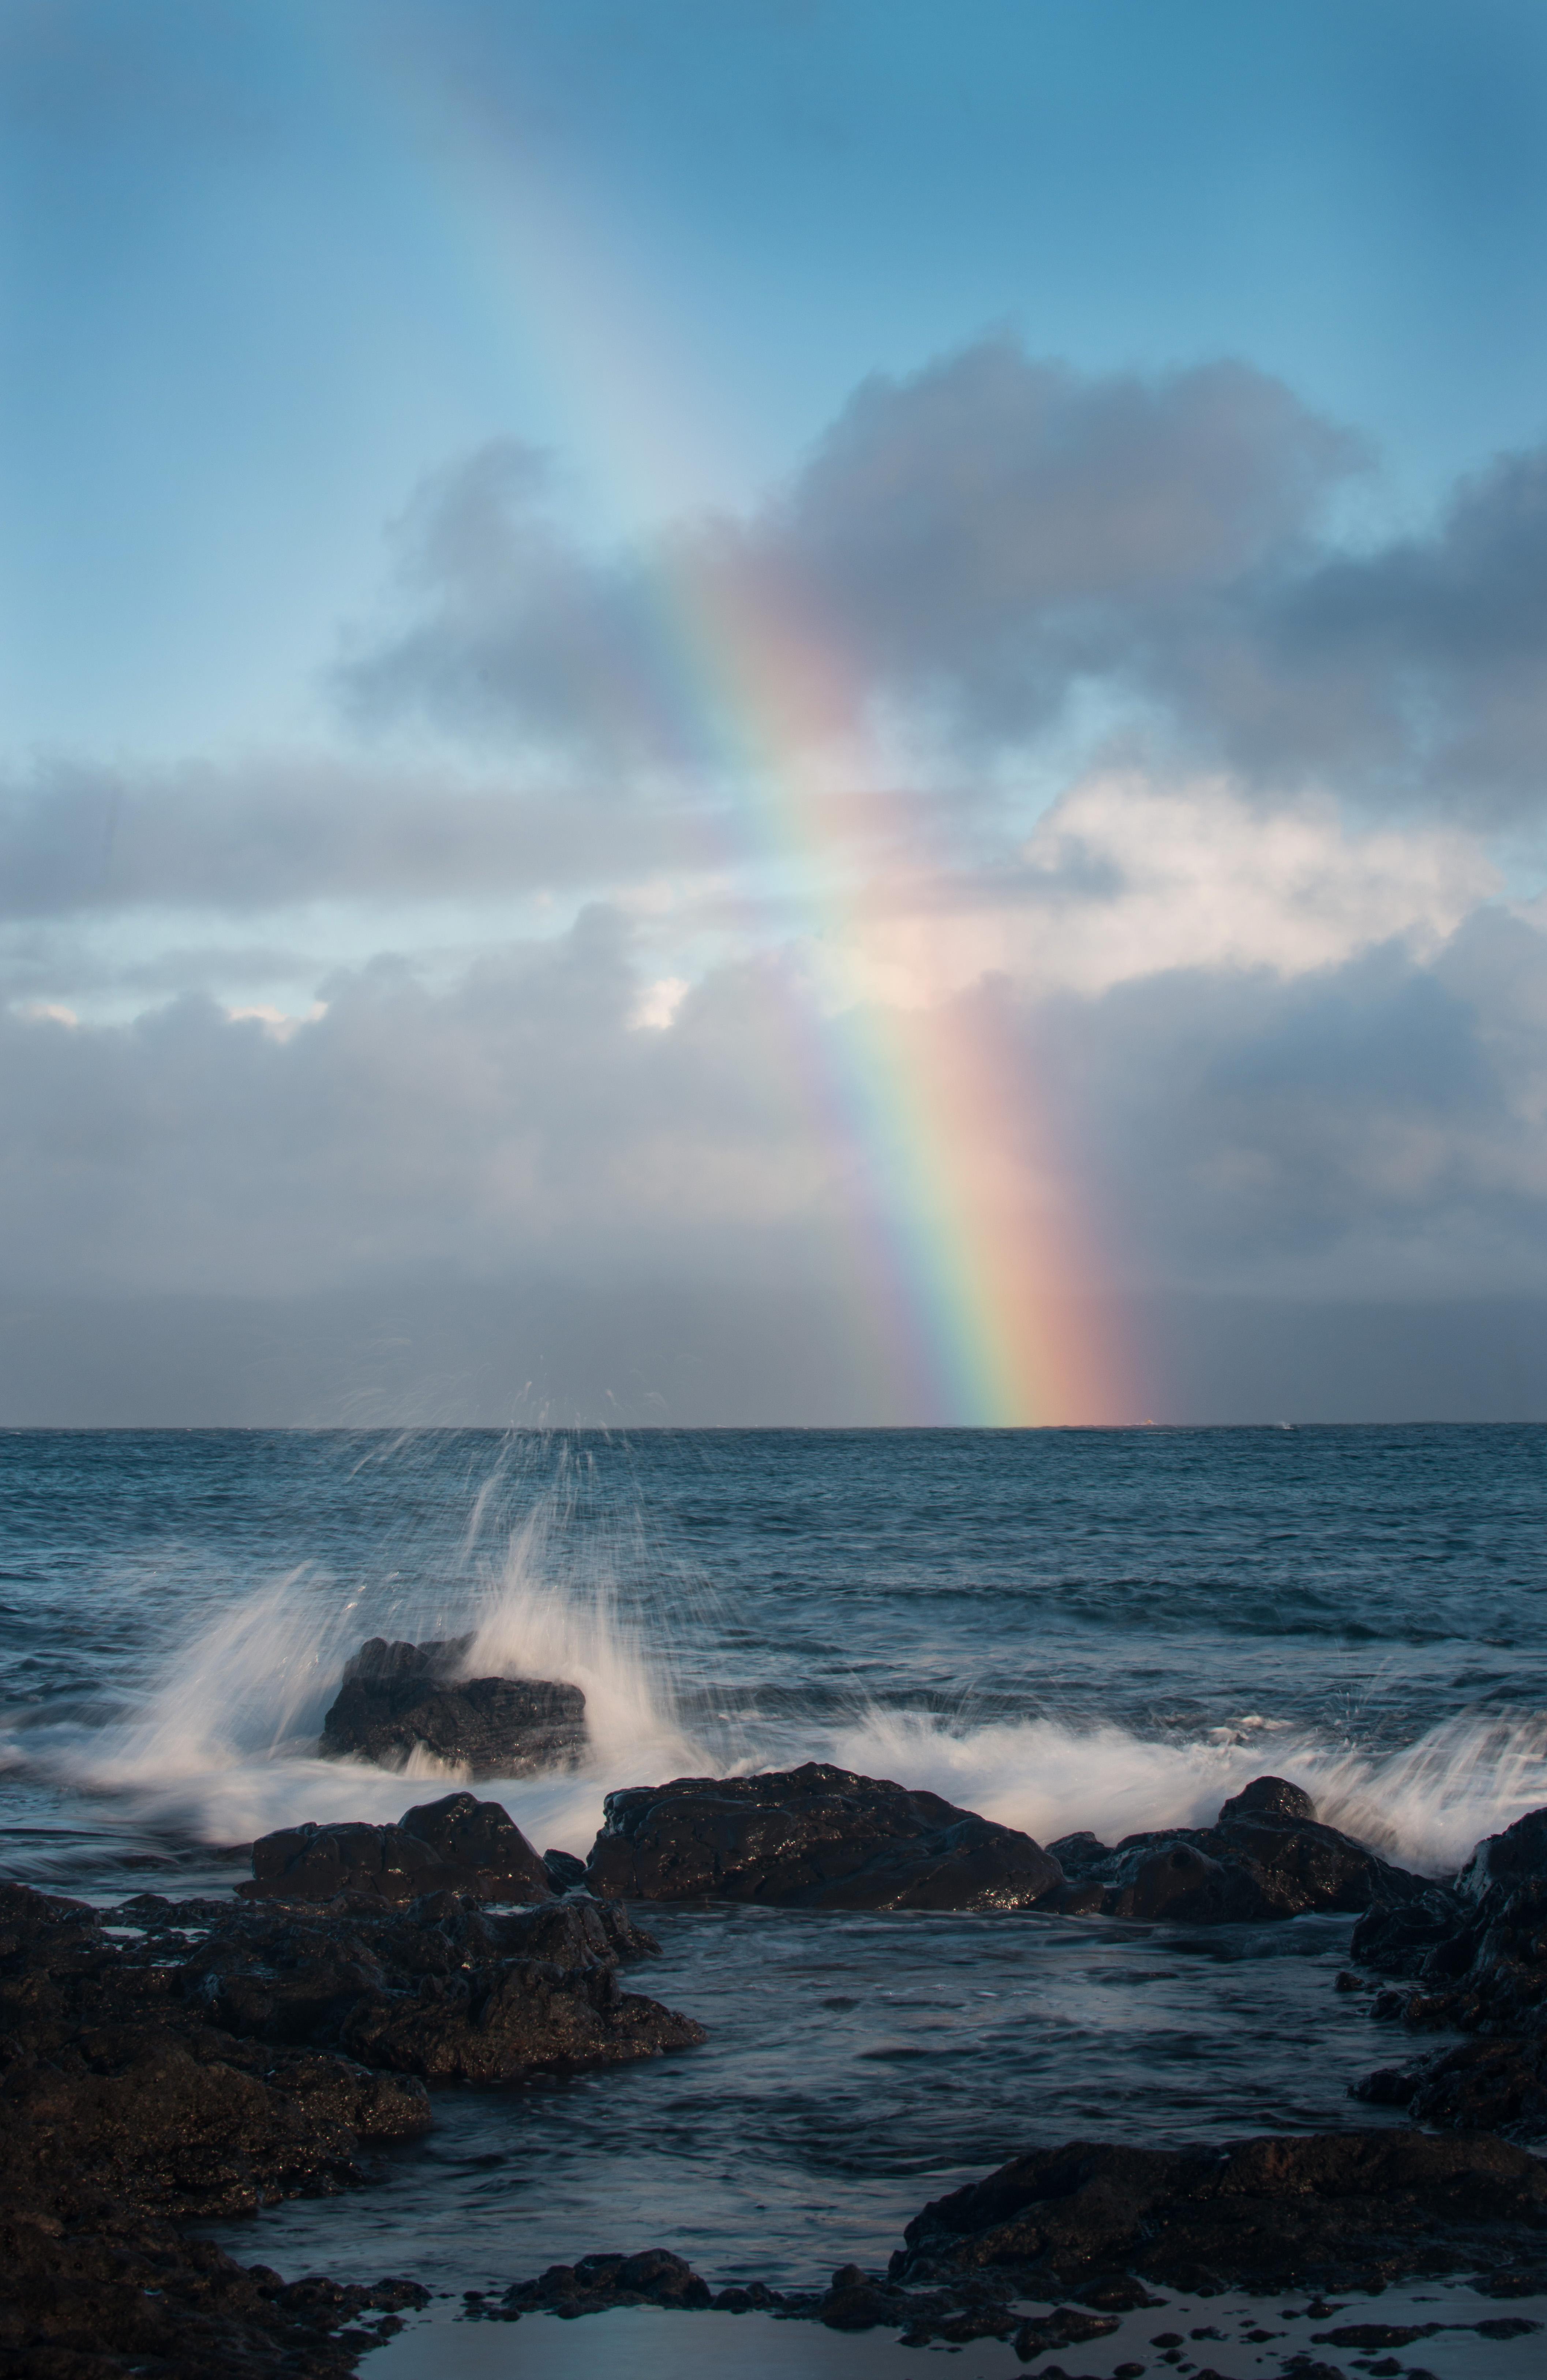 #rainbow, #maui, #hawaii, #rain, #showers, #ocean, #waves, #landscape, #nature